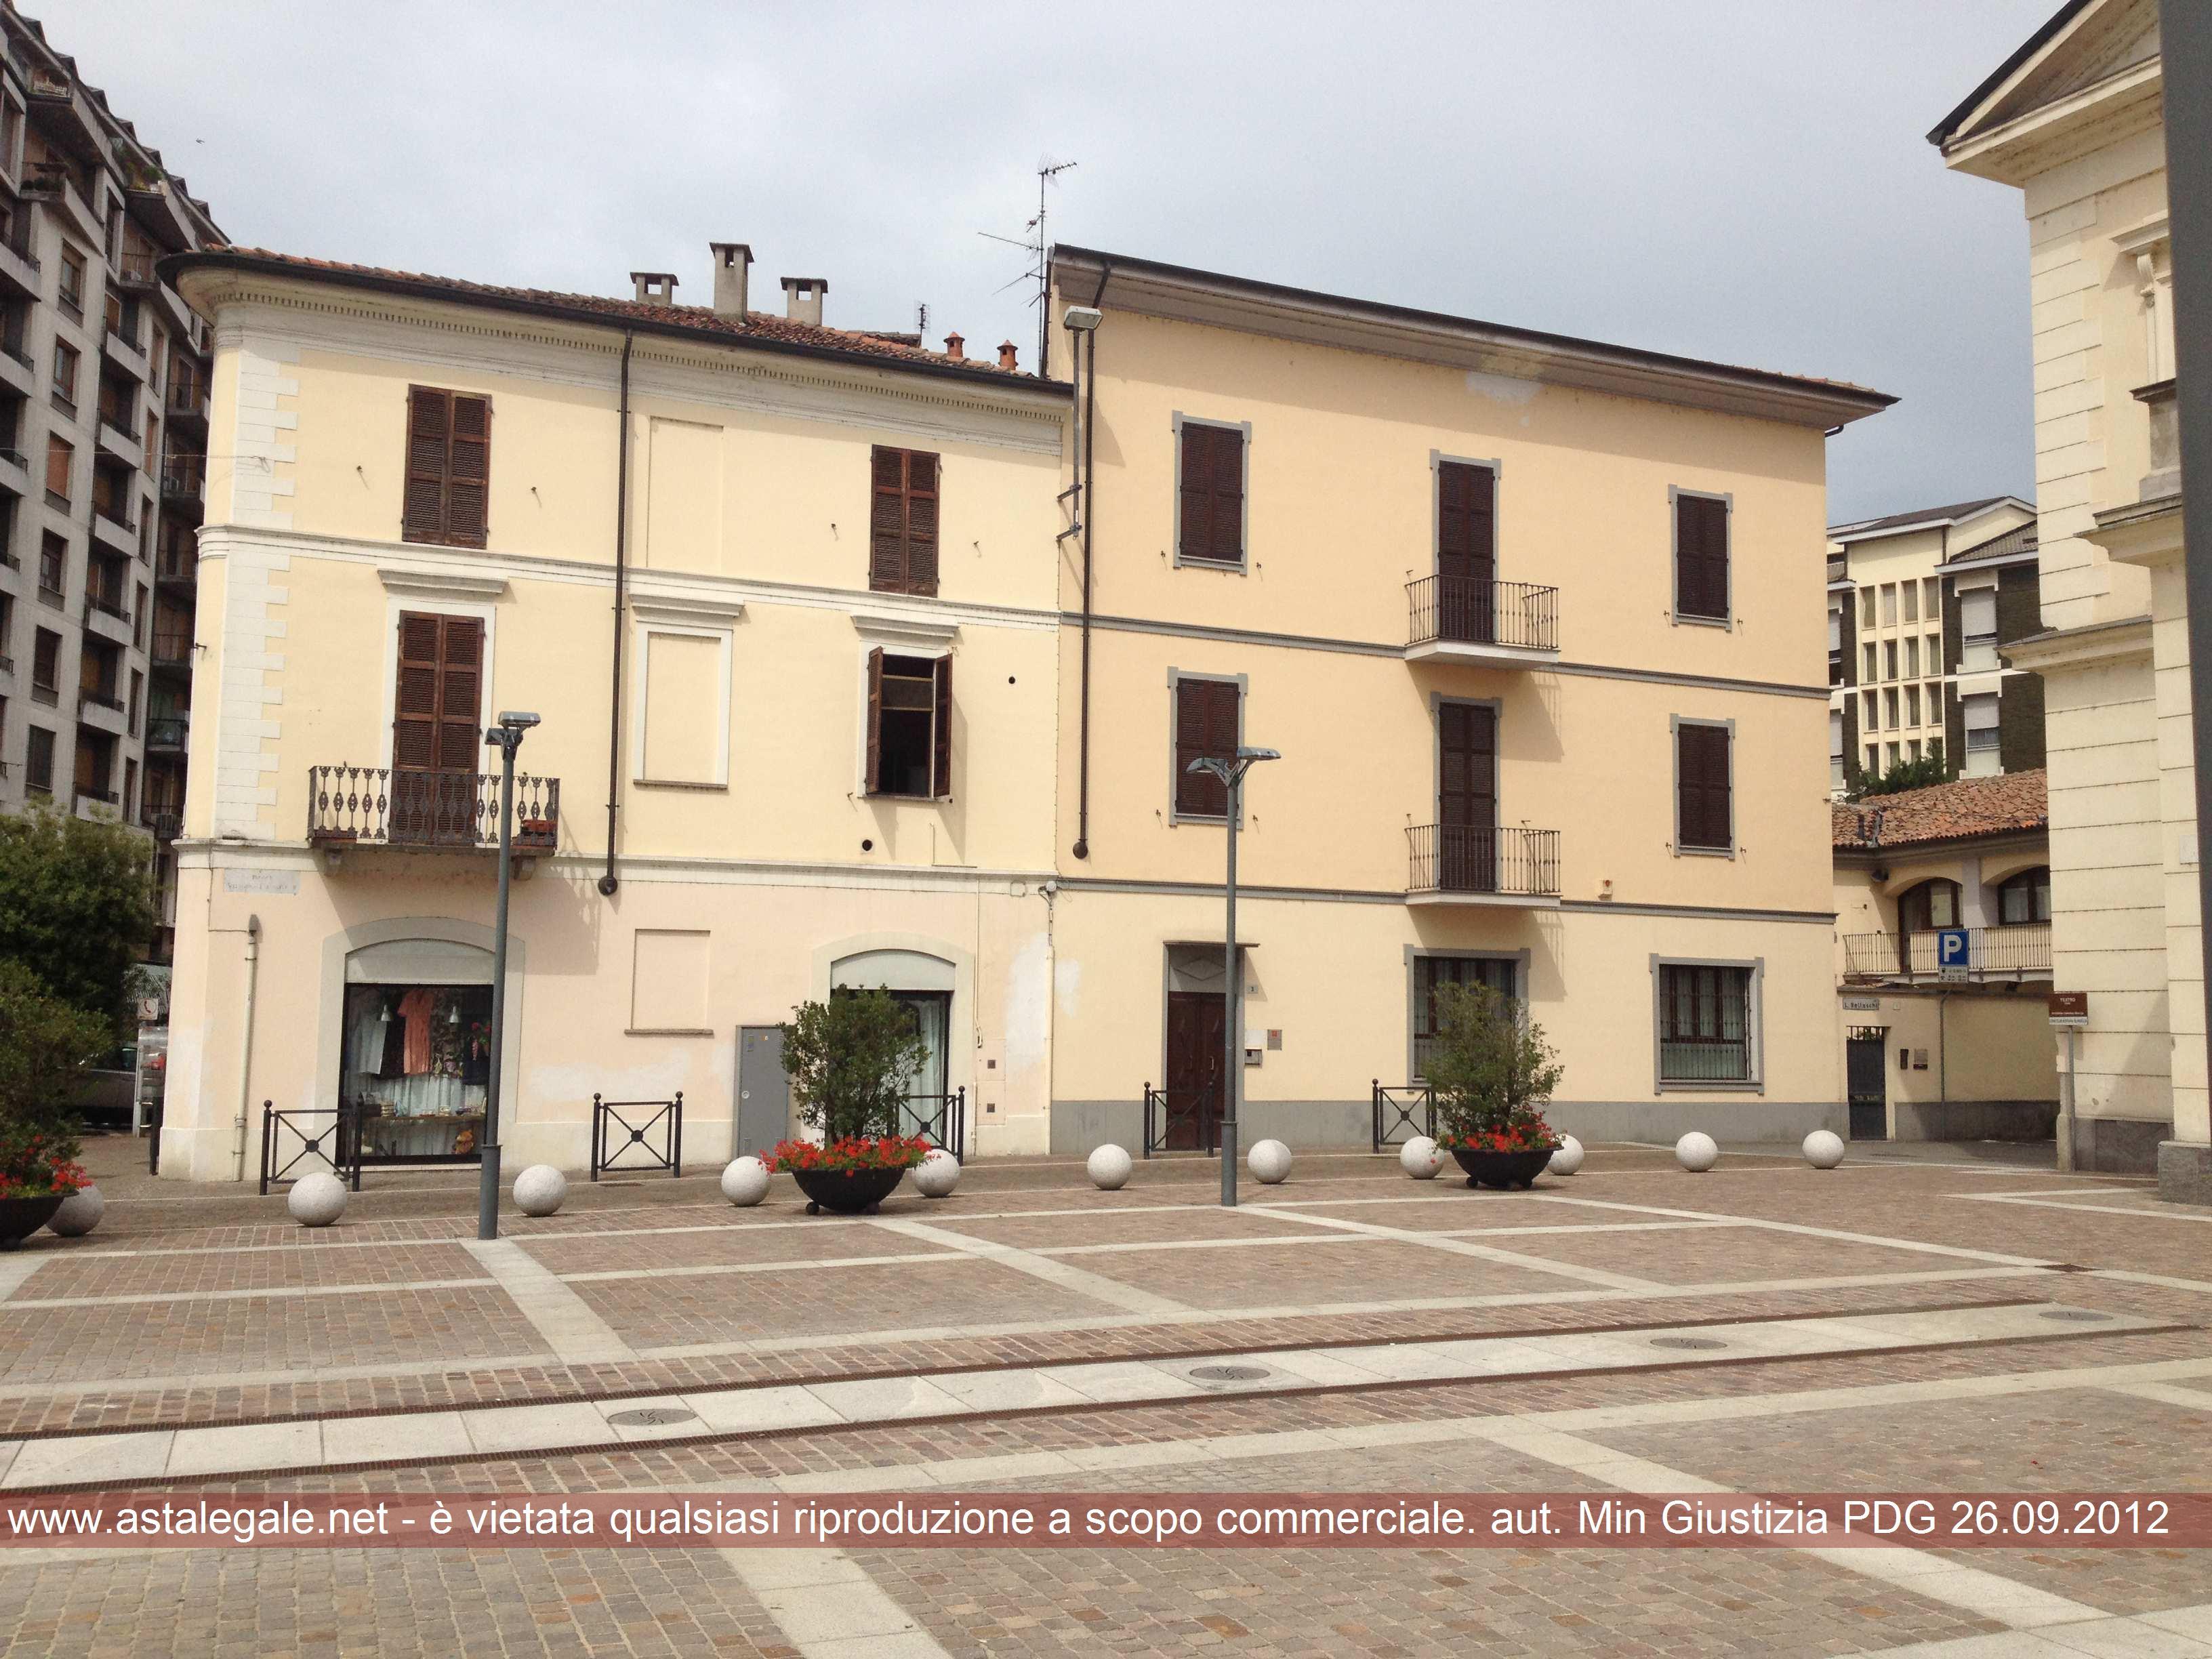 Mortara (PV) Piazza Vittorio Emanuele II 3